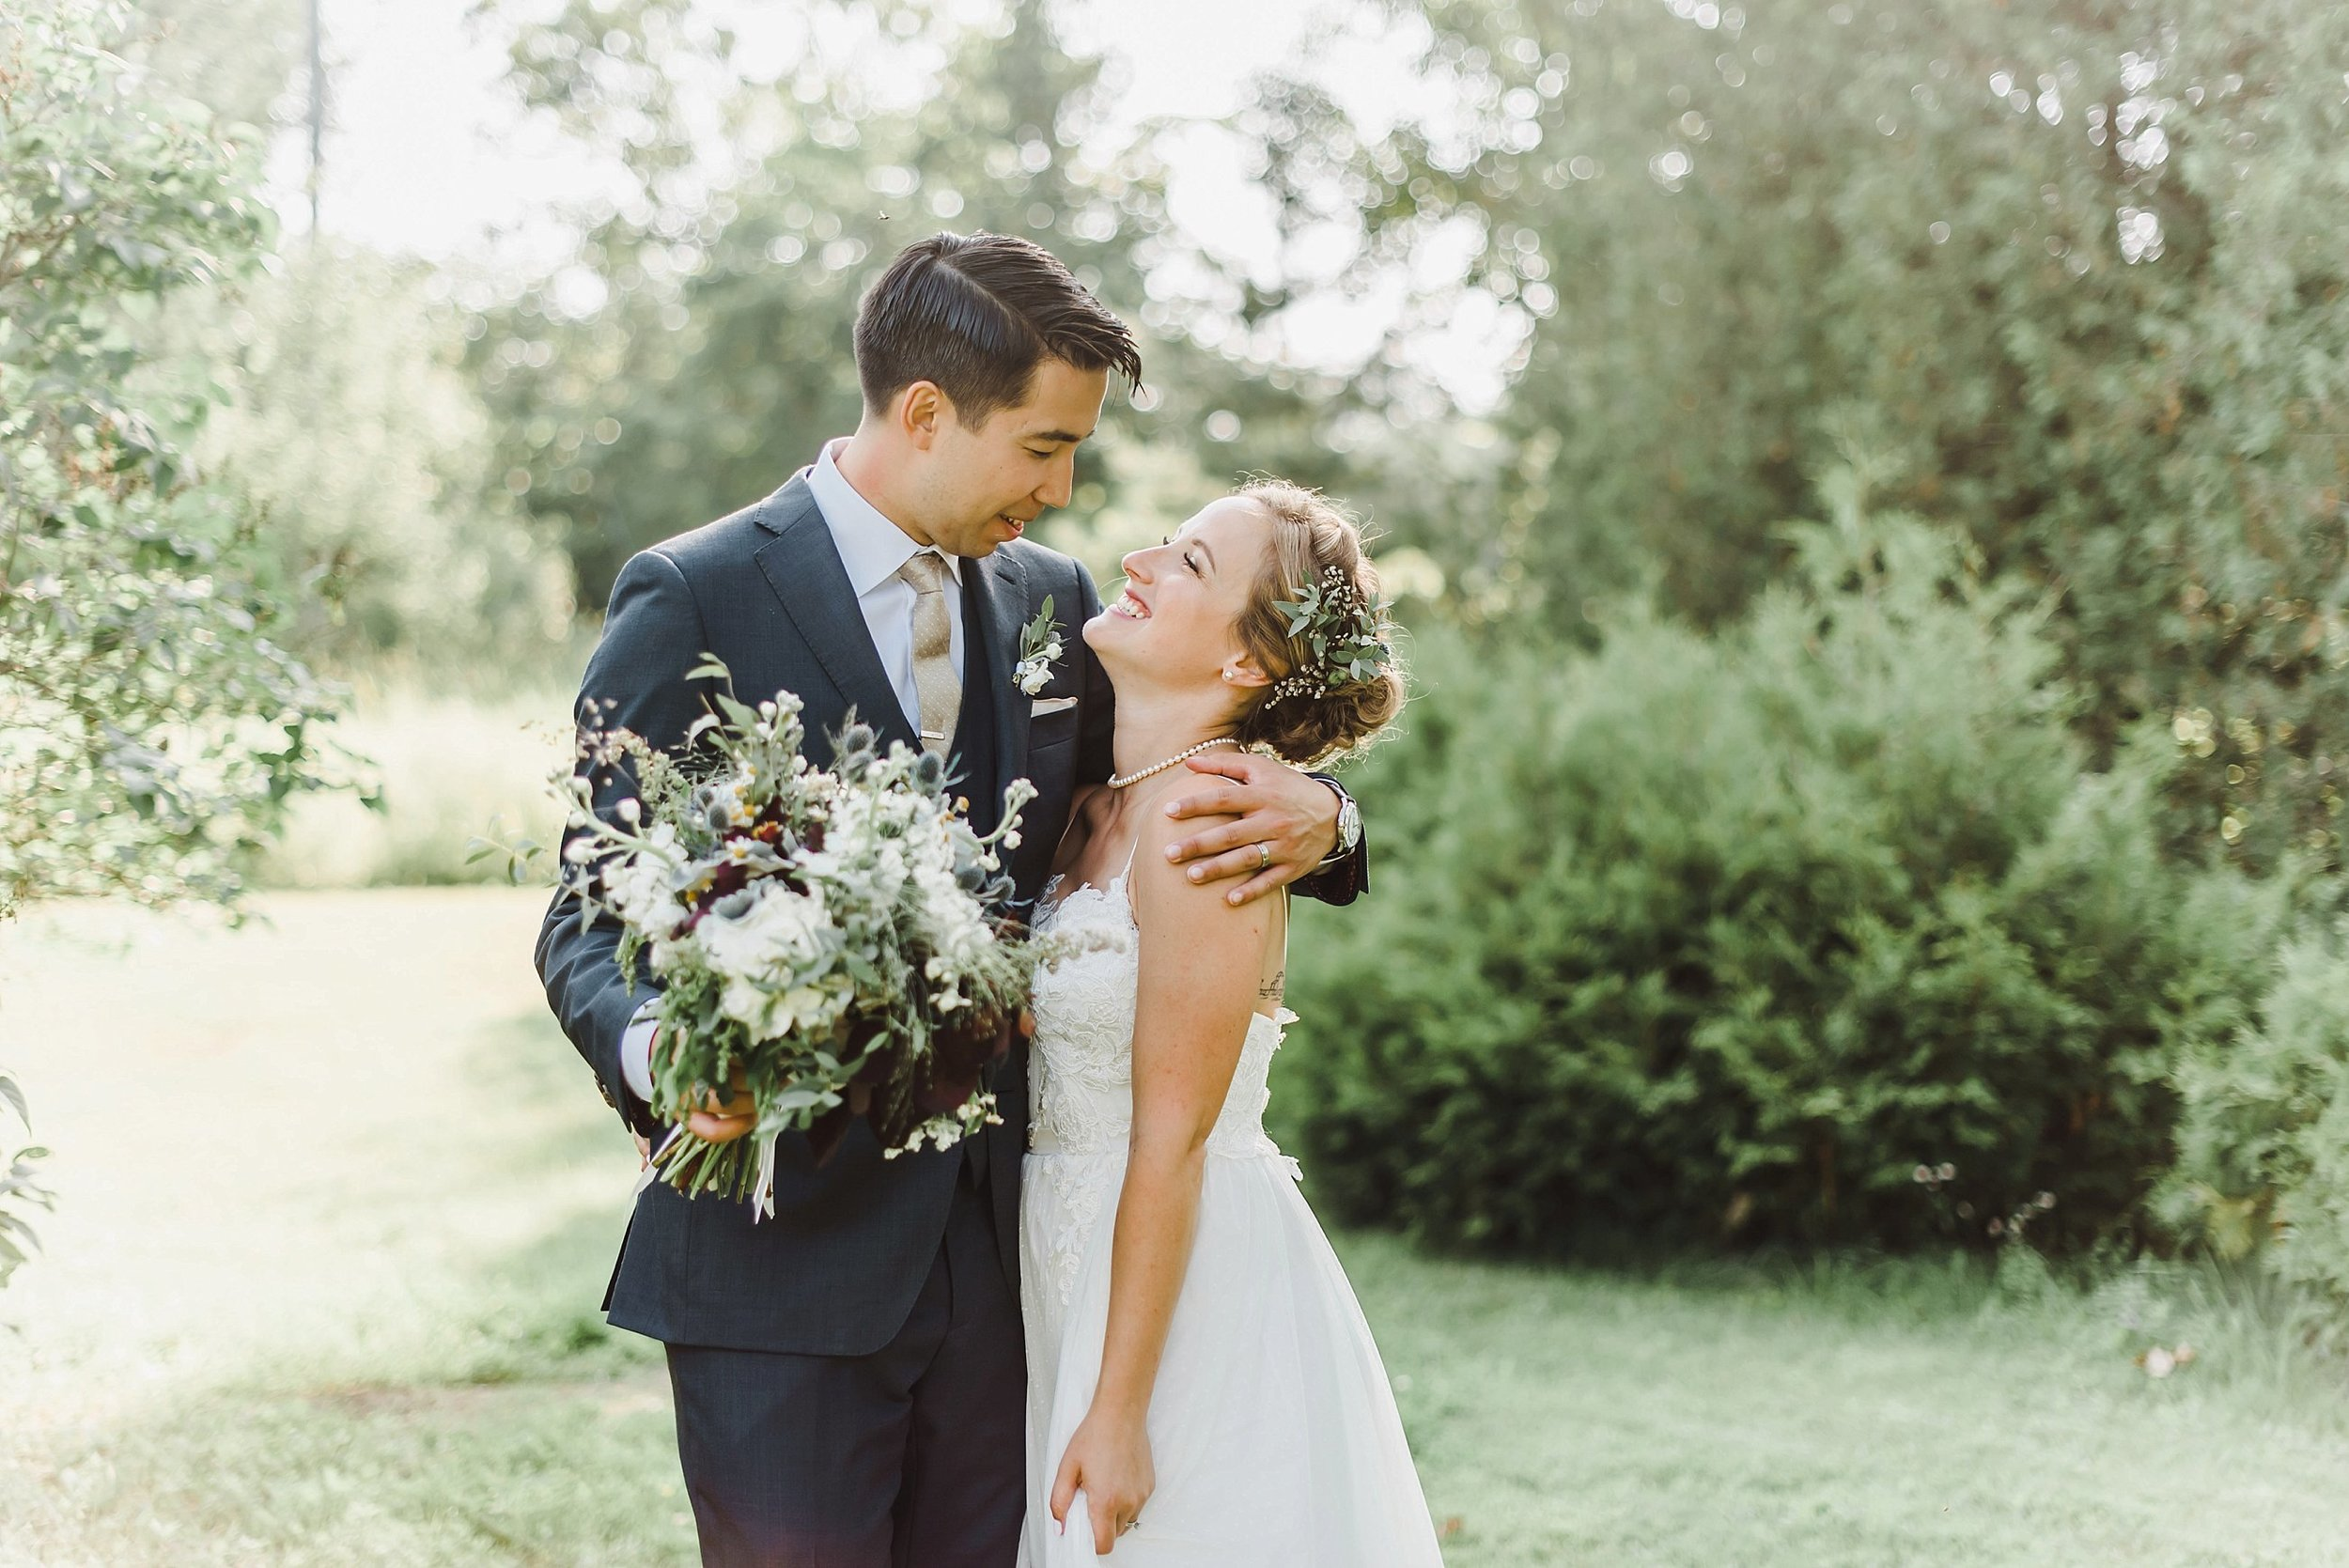 light airy indie fine art ottawa wedding photographer | Ali and Batoul Photography_0851.jpg